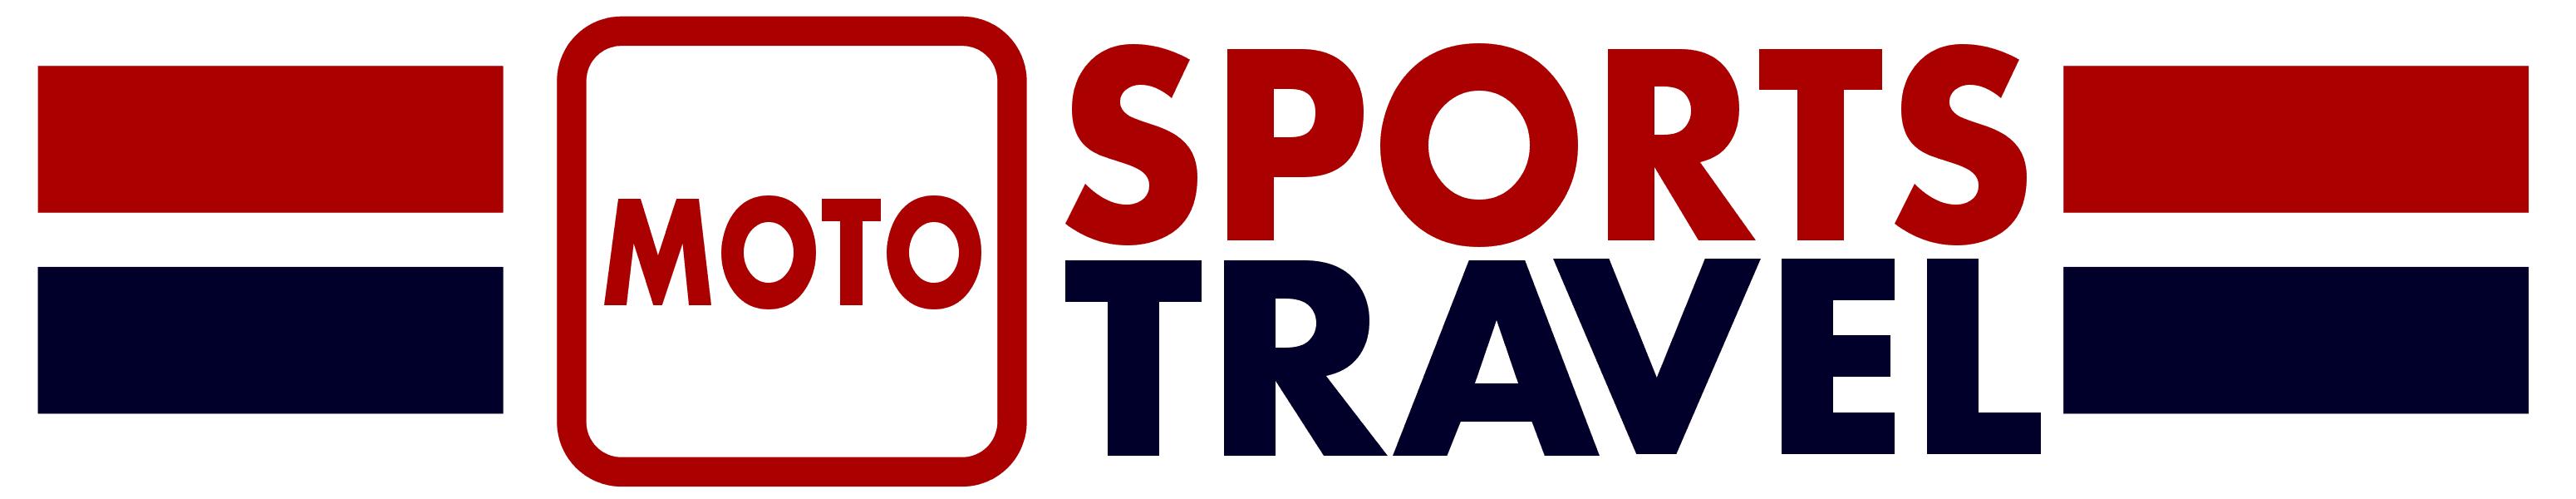 MOTOSPORTS TRAVEL